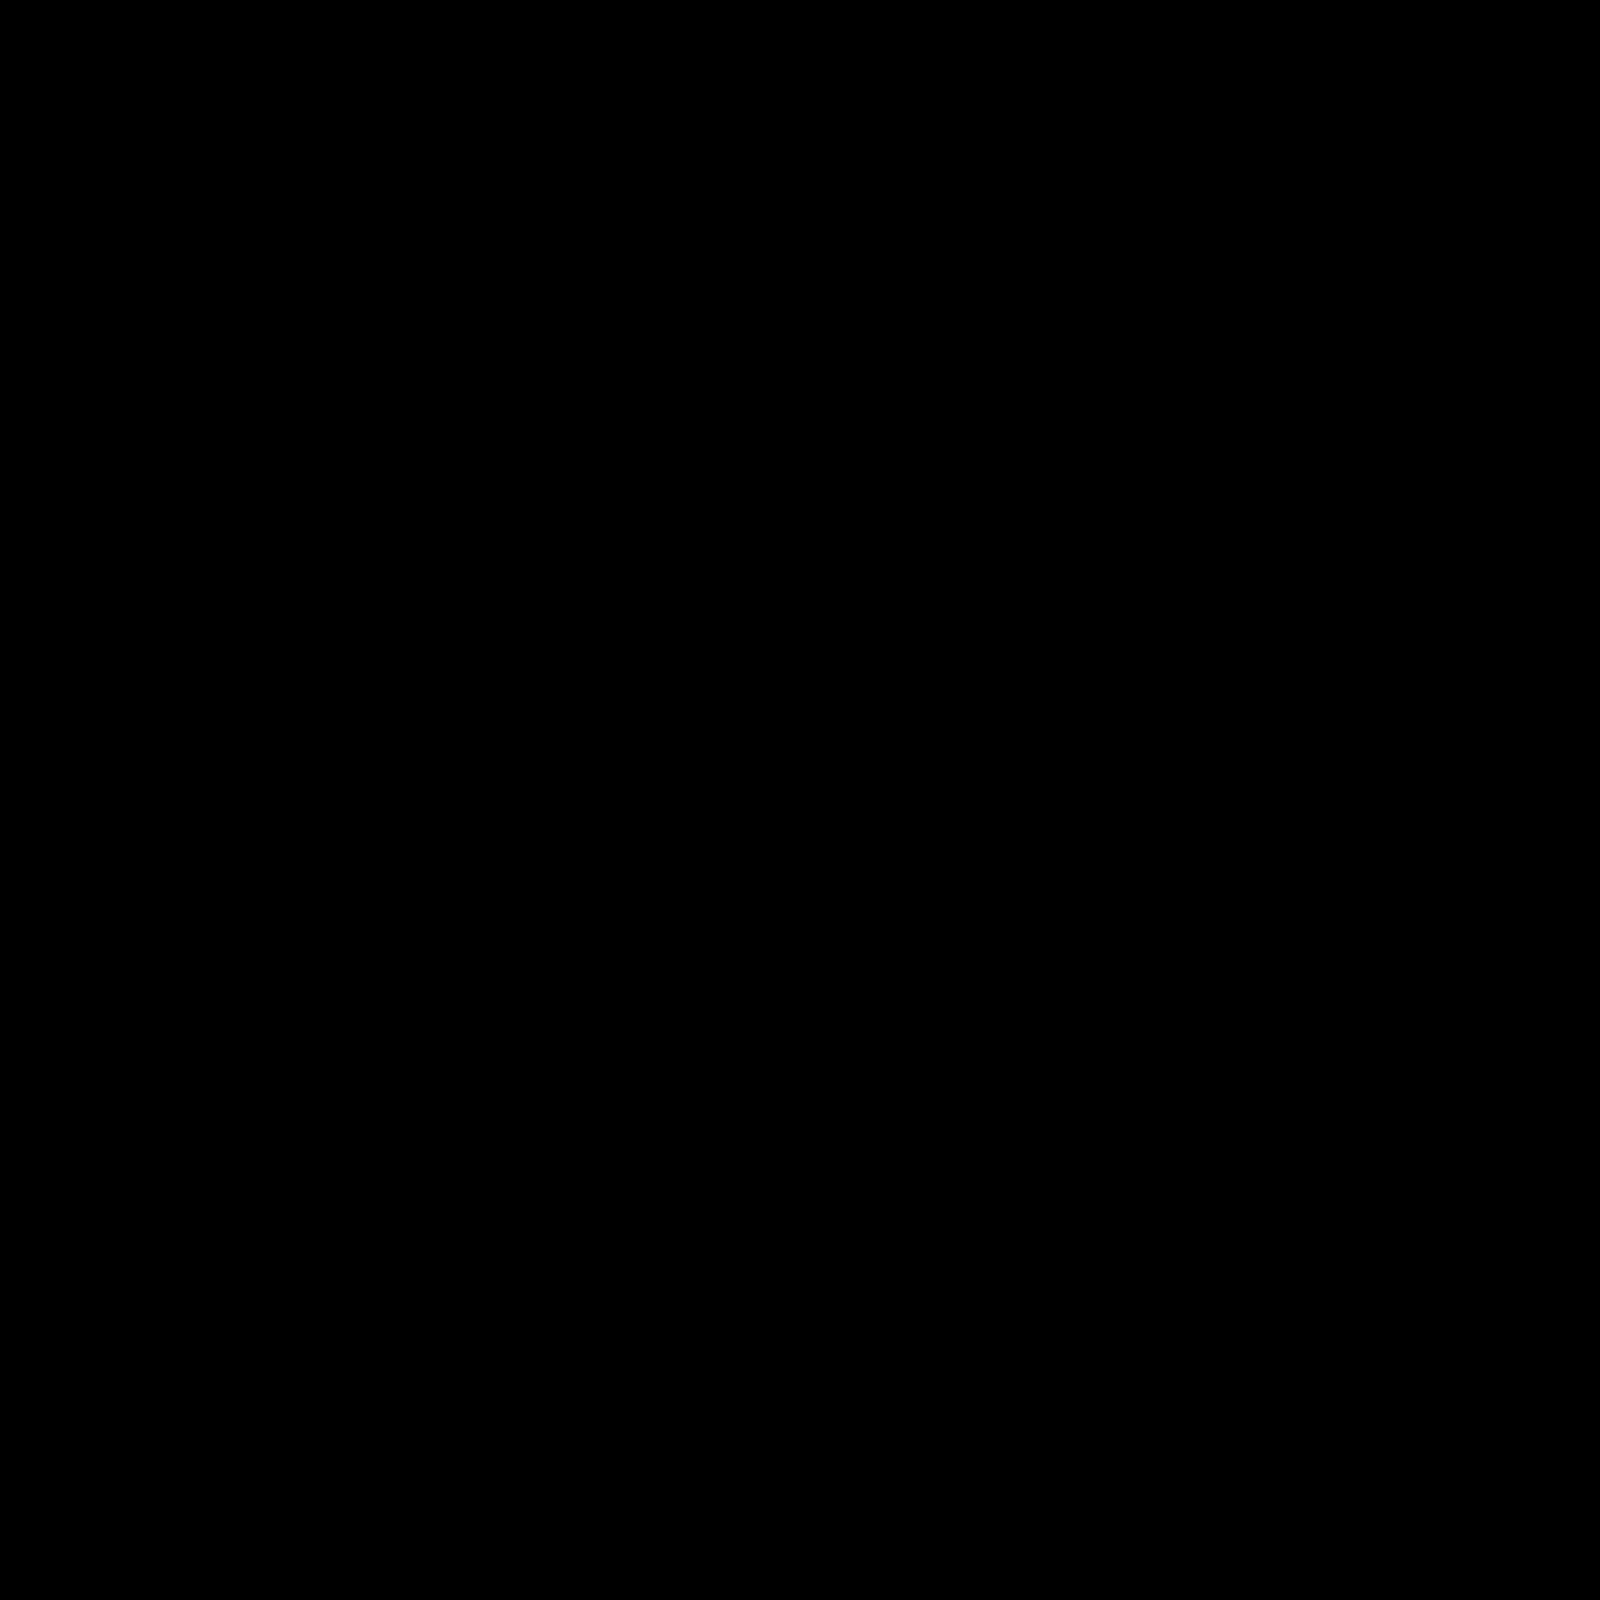 Firework Filled icon